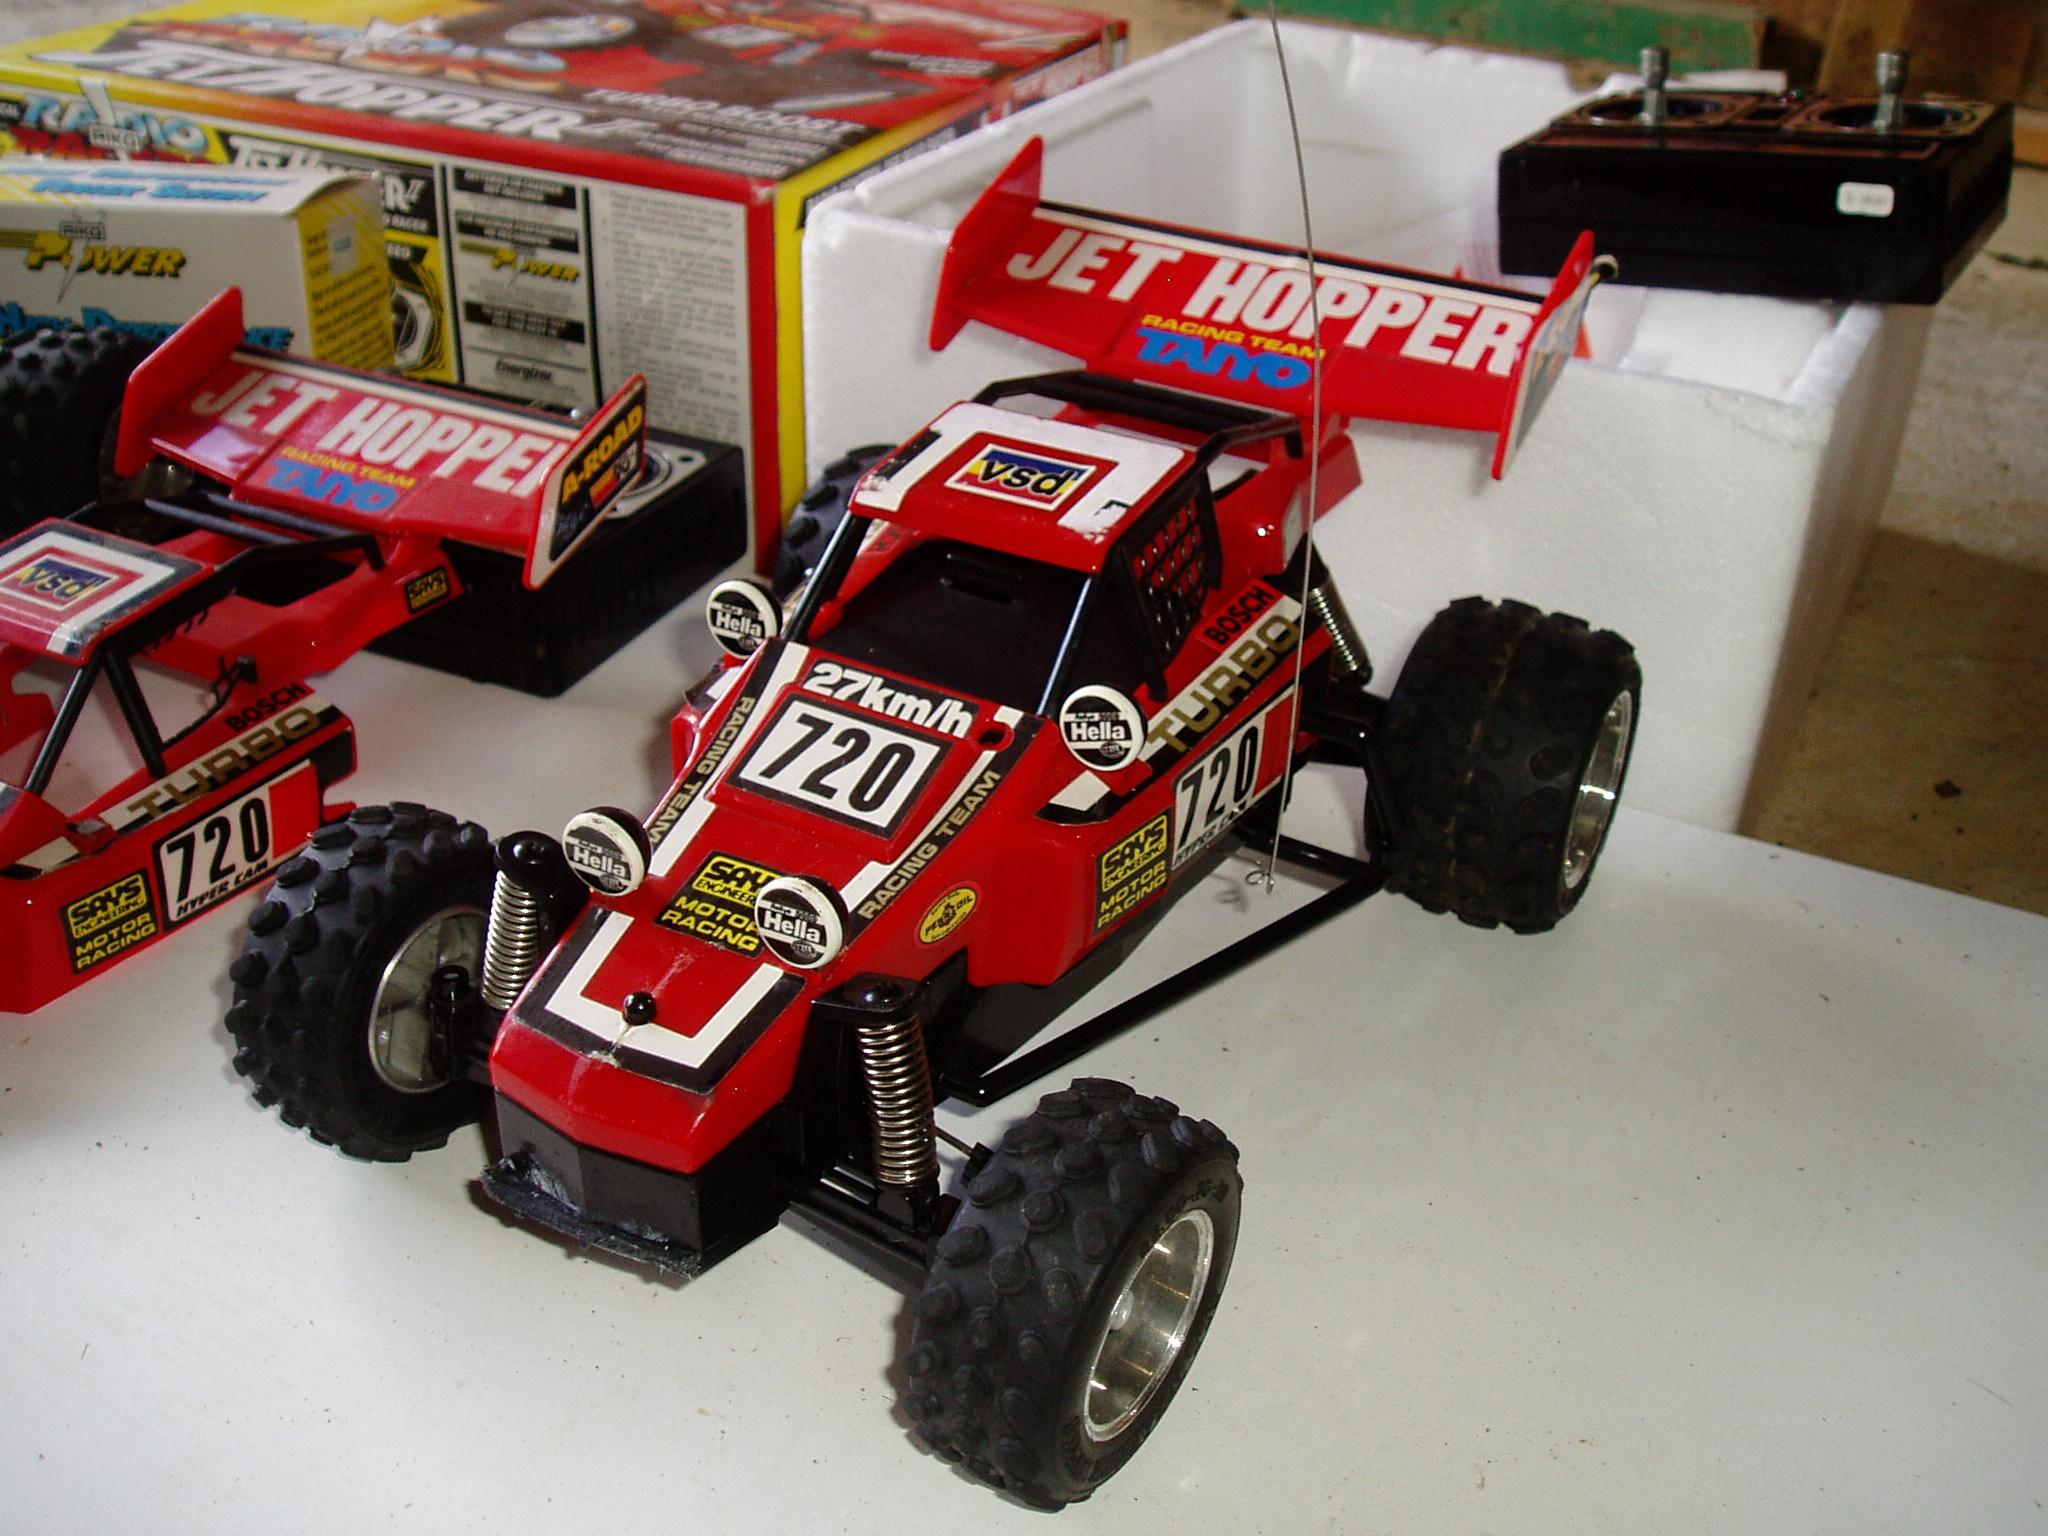 Jet Hopper Other Makes Tamiyaclubcom